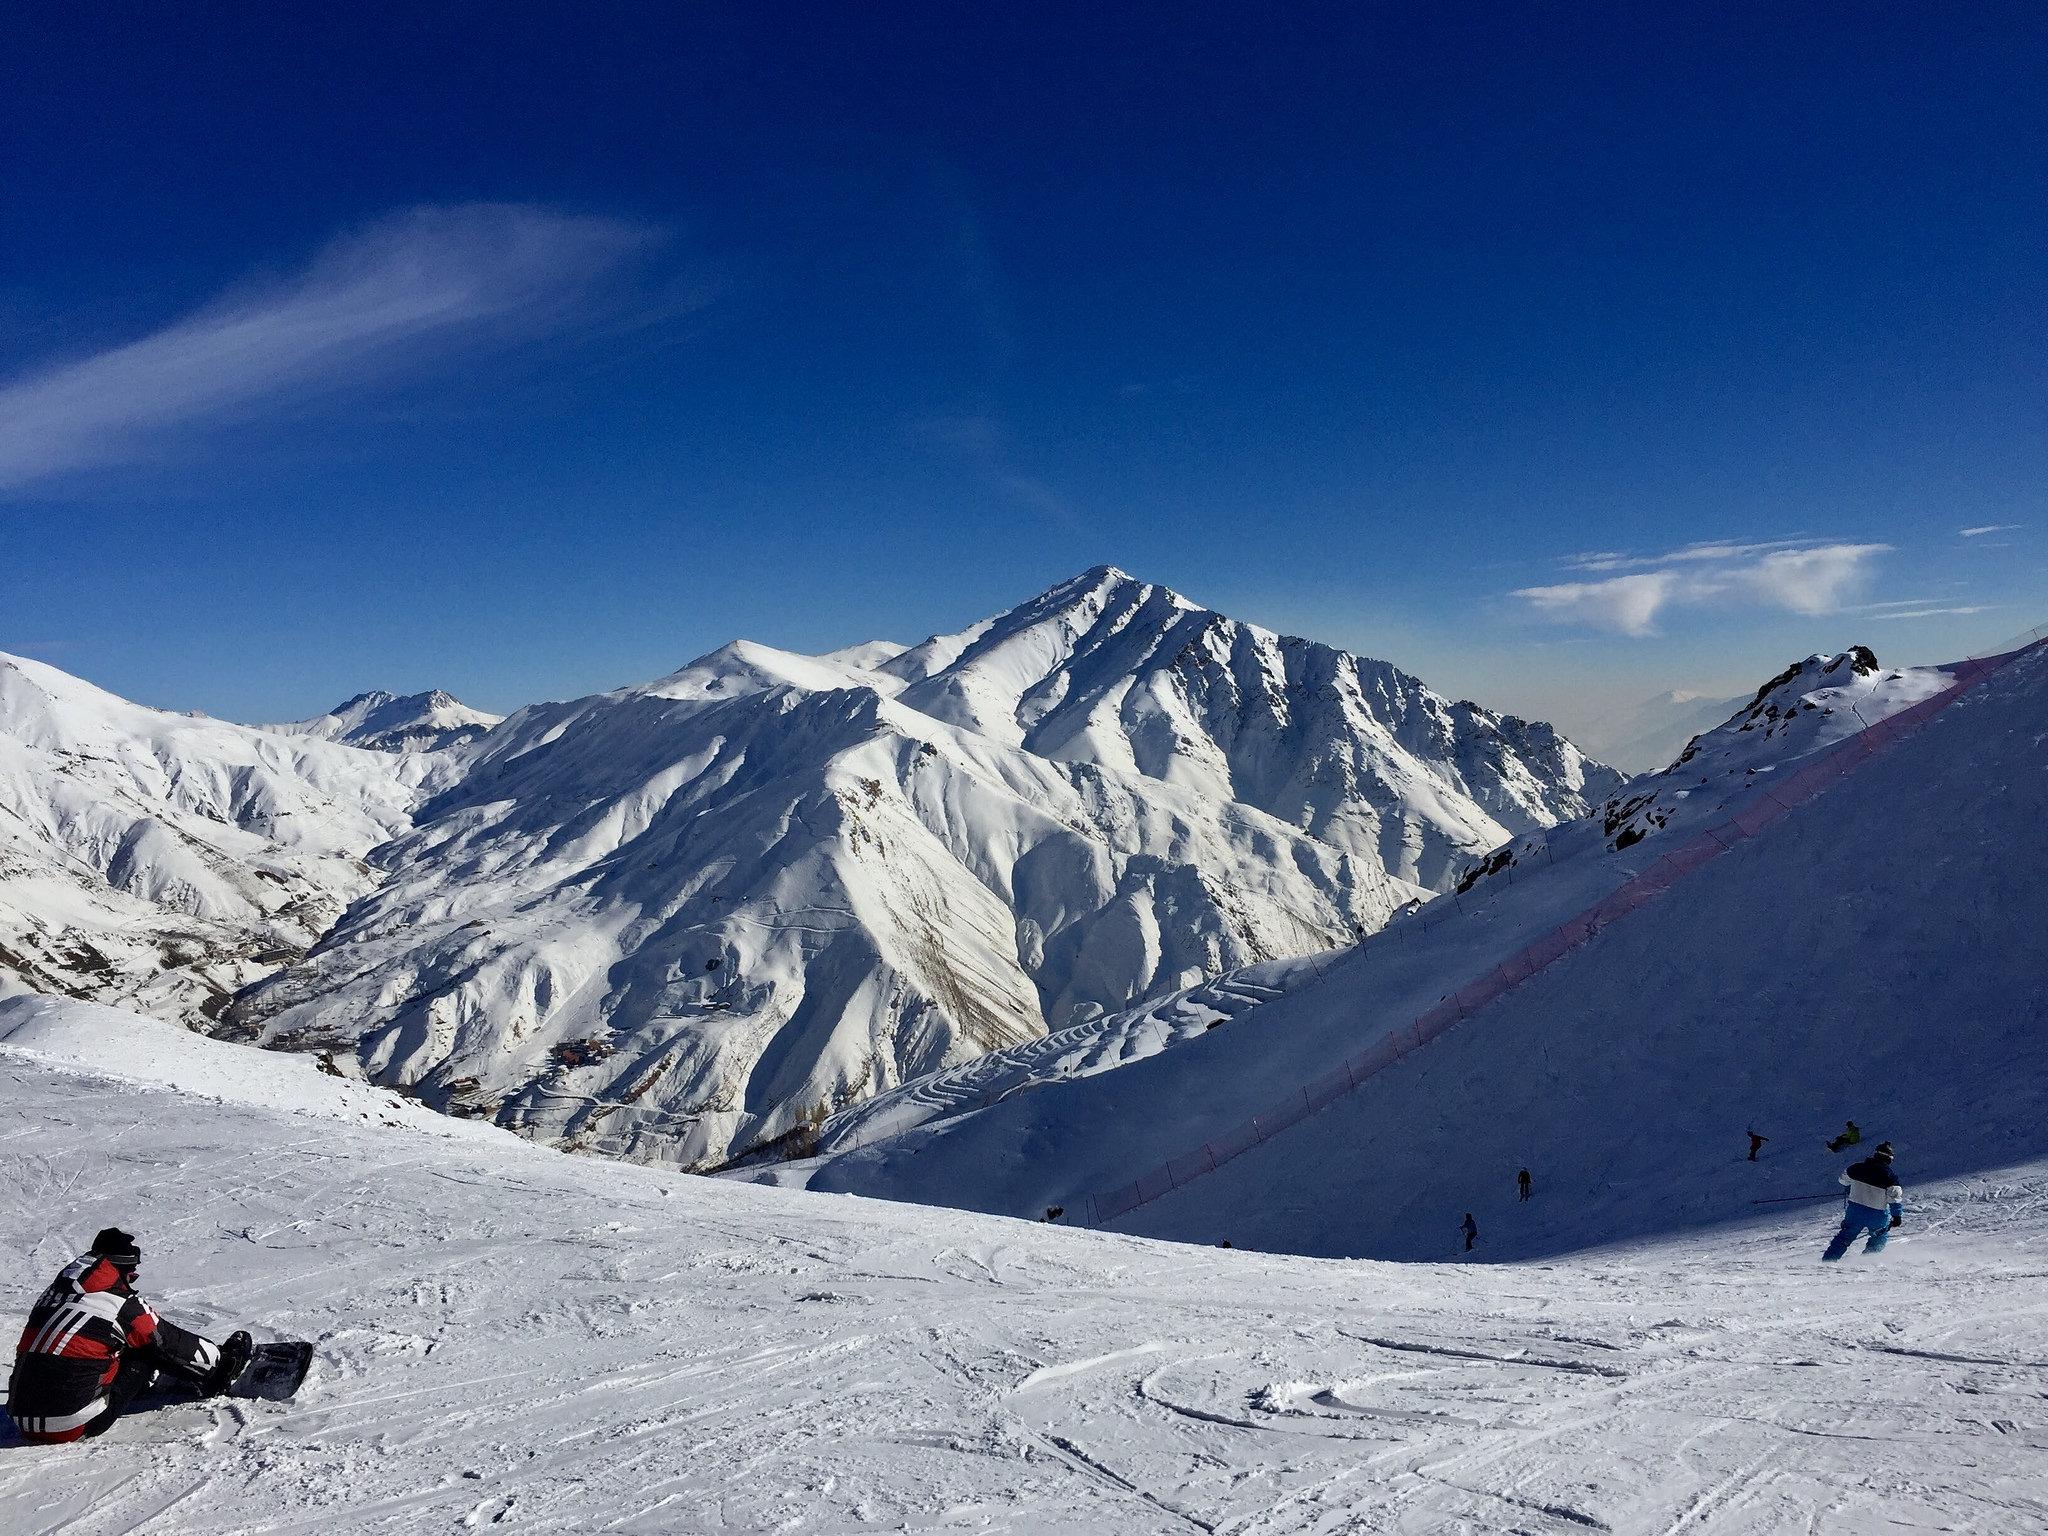 ski in hakuba with fwq skier kyoto harada (half-day). 1/2-day trip